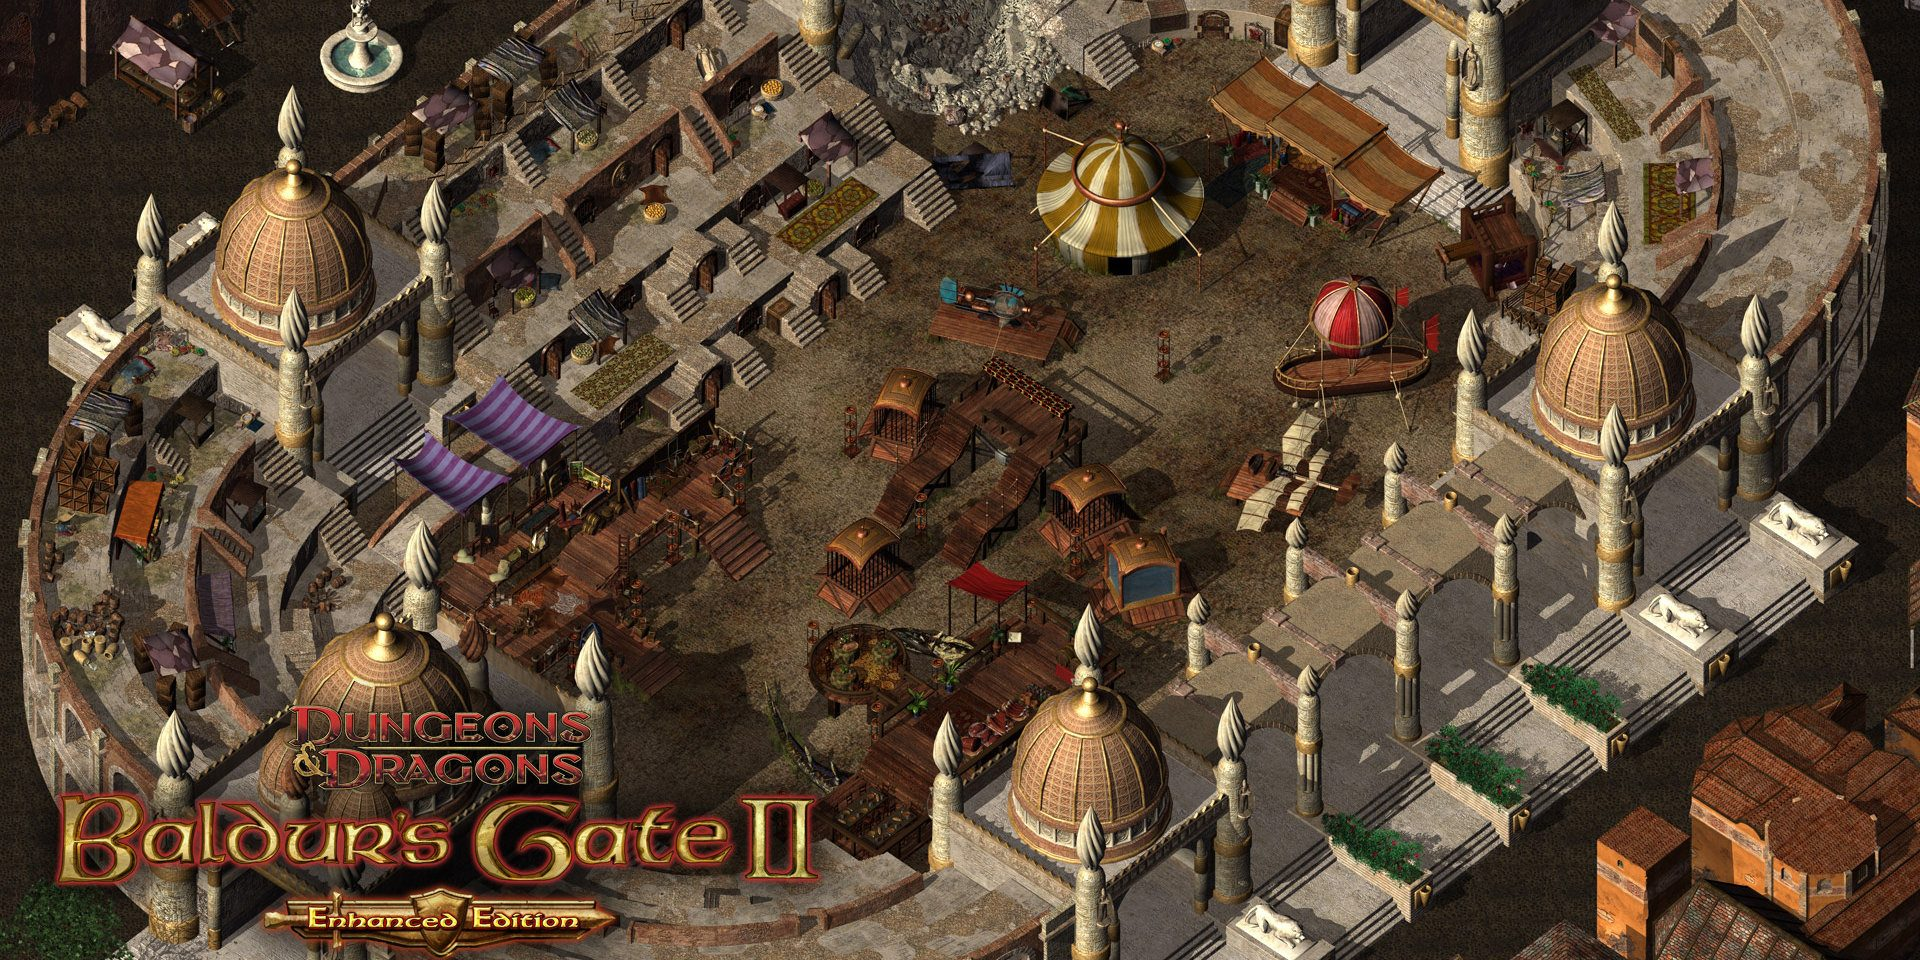 Today's Android game/app deals + freebies: Baldur's Gate II, Rebuild 3, more